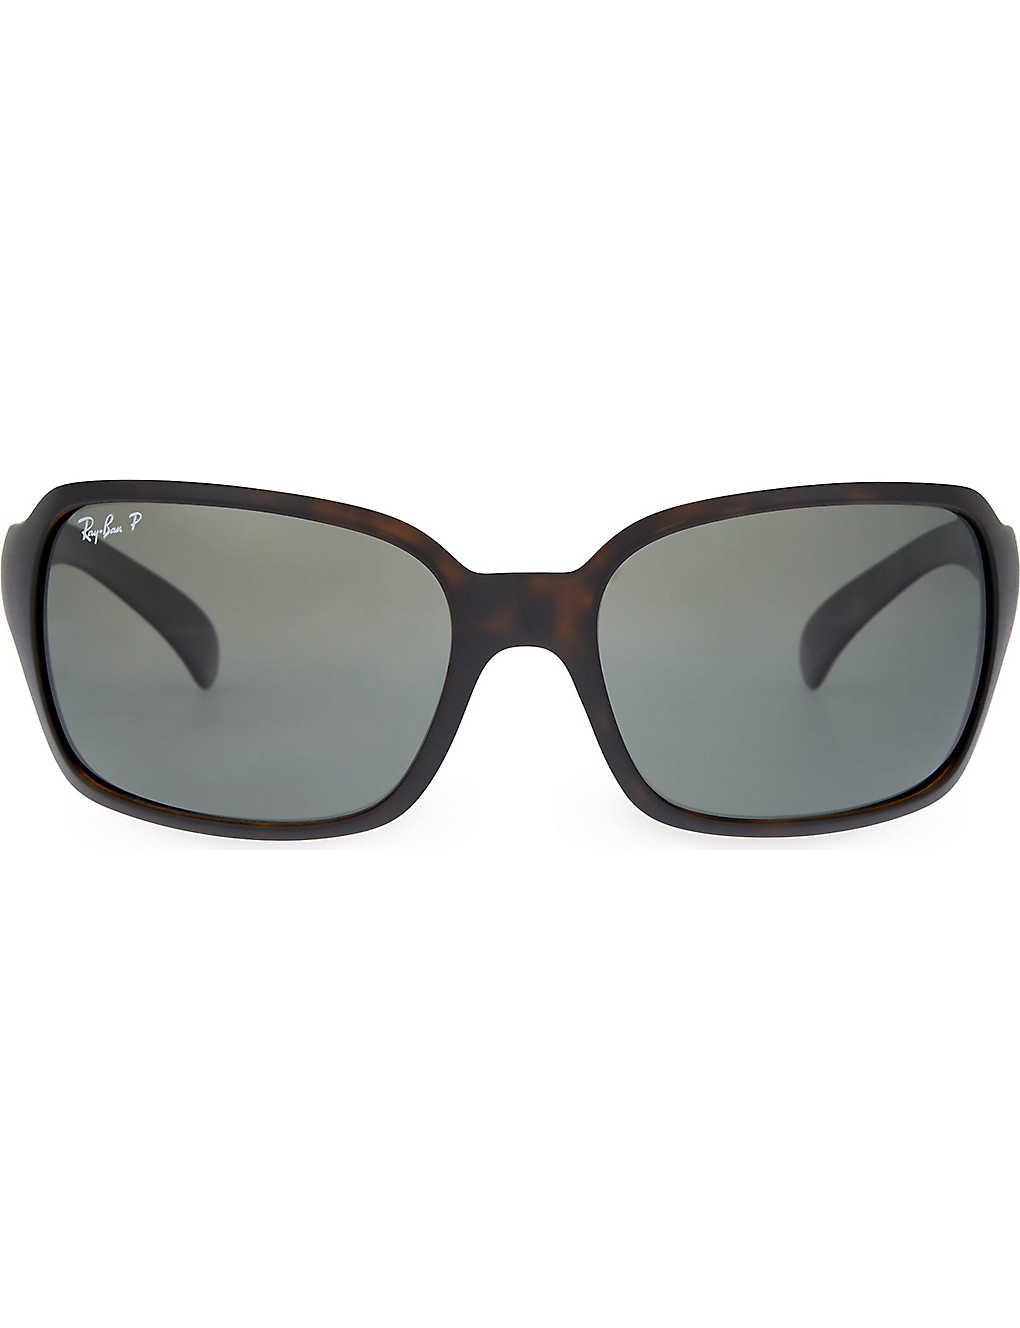 624e48b354 RAY-BAN - RB4068 square sunglasses